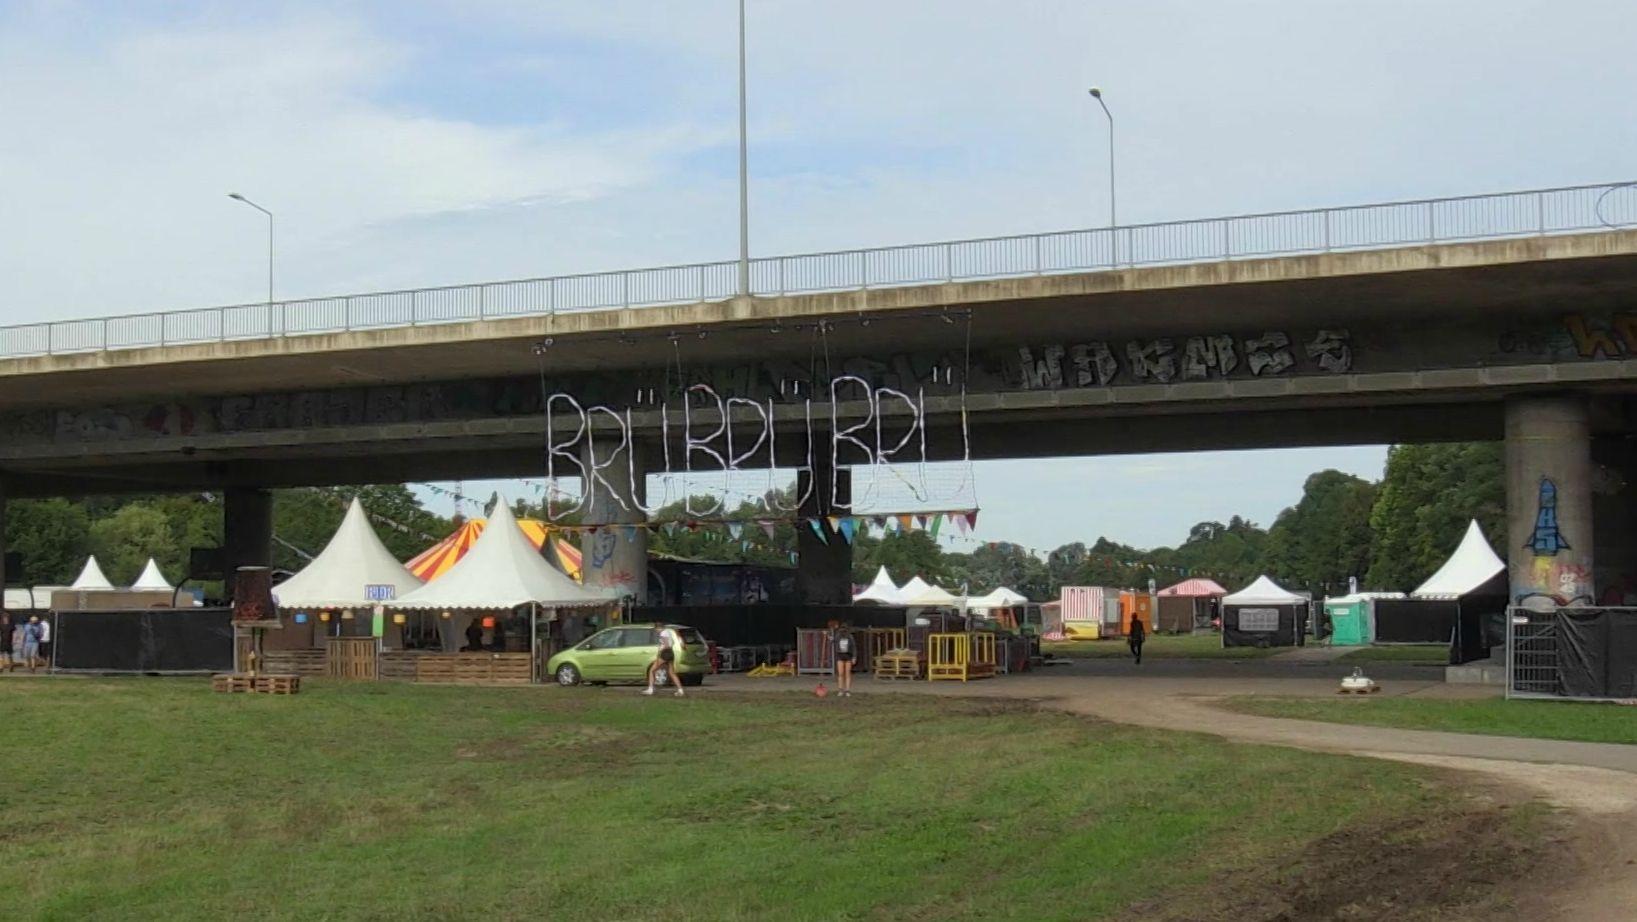 Das Nürnberger Brückenfestival unter der Theodor-Heuss-Brücke beginnt.